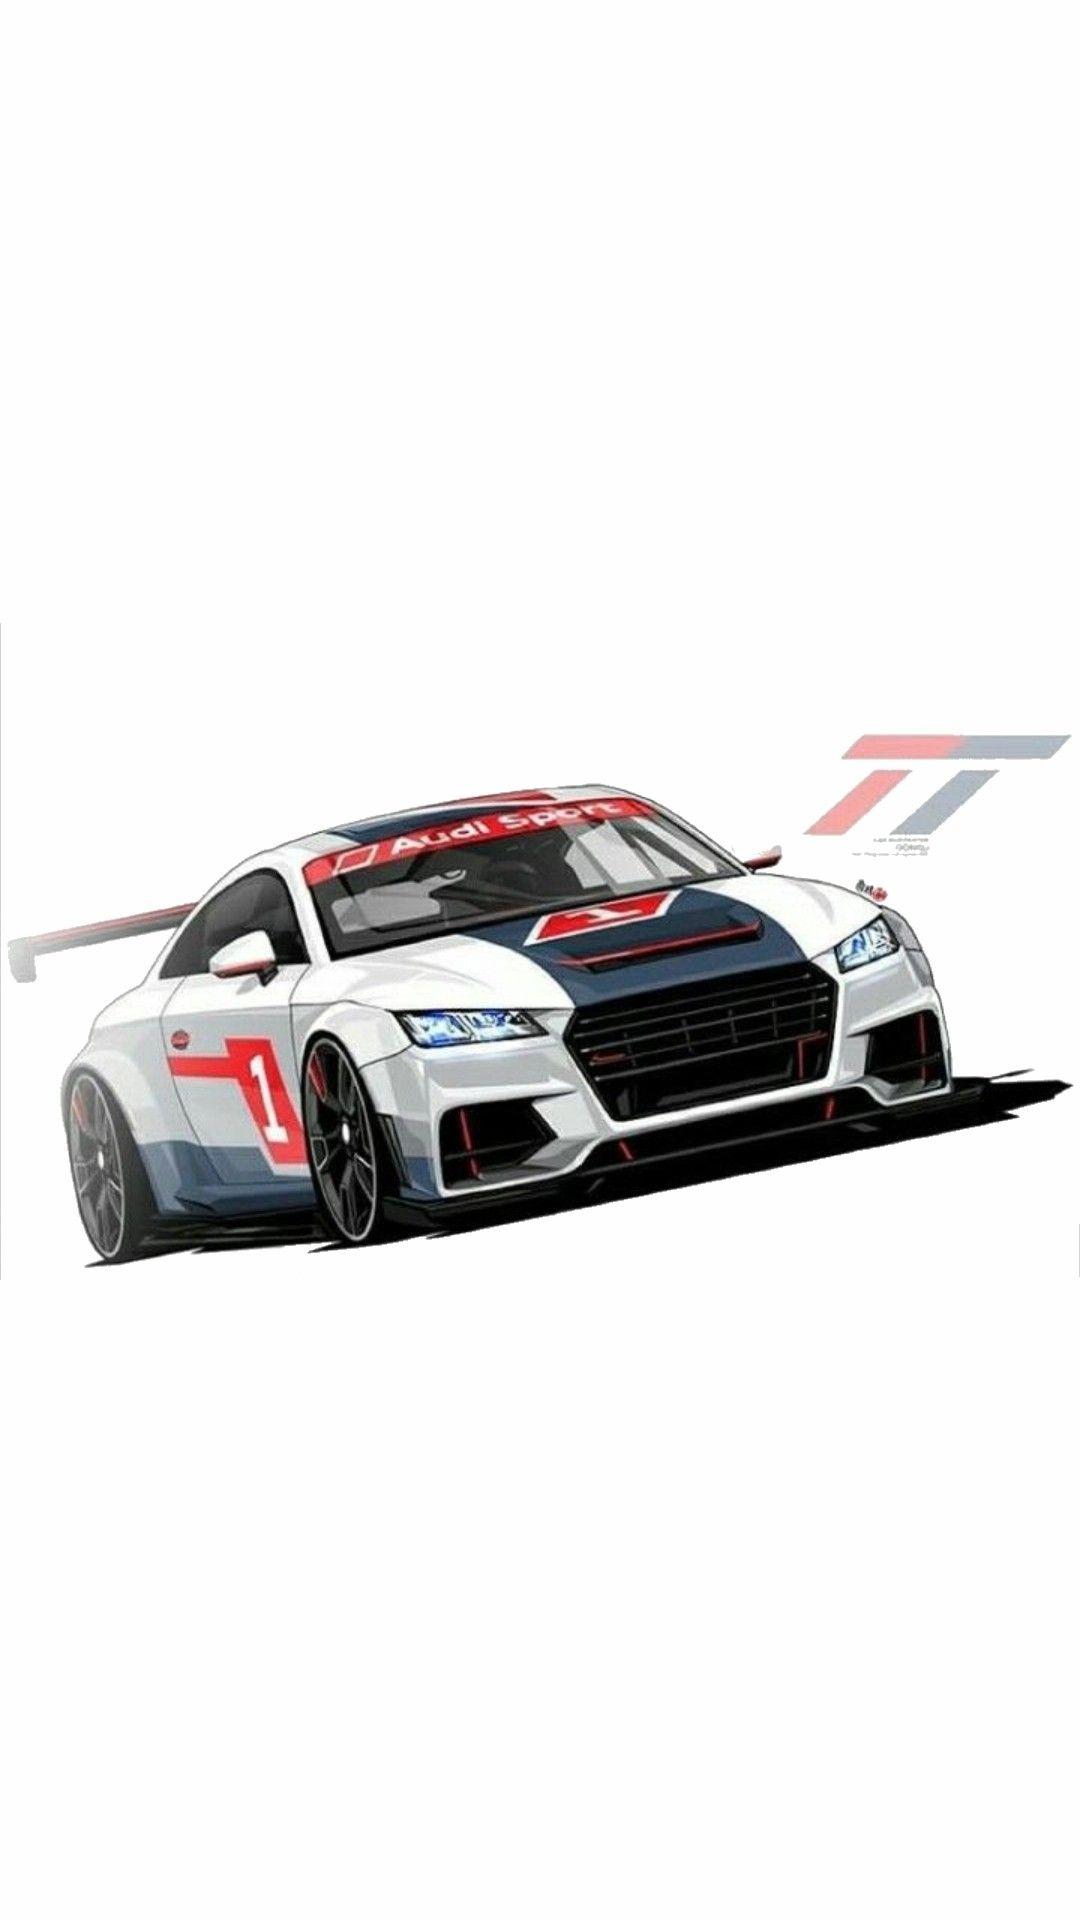 Audi R8 TT Race Car iPhone Wallpaper iphoneswallpapers com